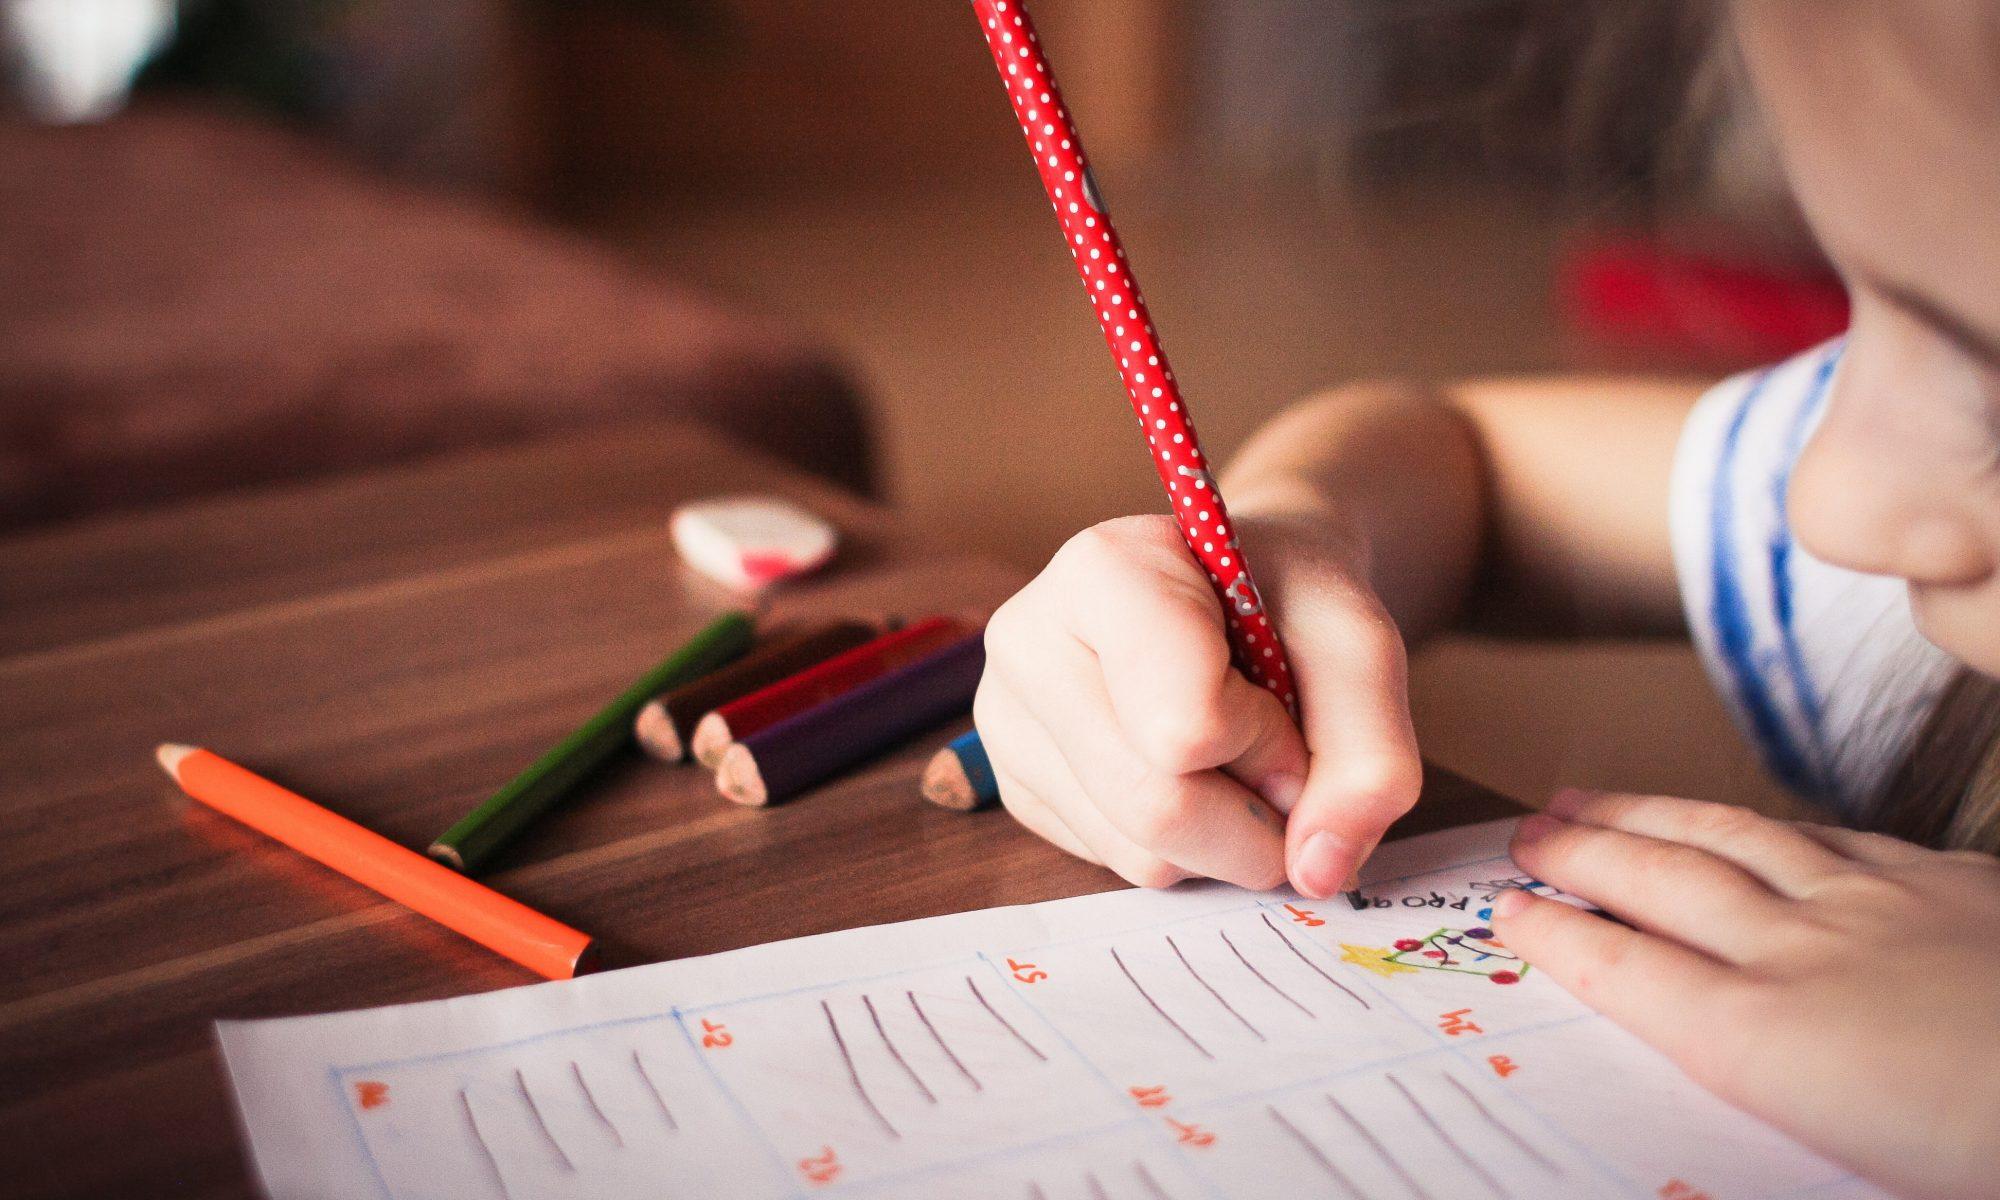 PlusoptixUSA Blog_blur-child-classroom-256468